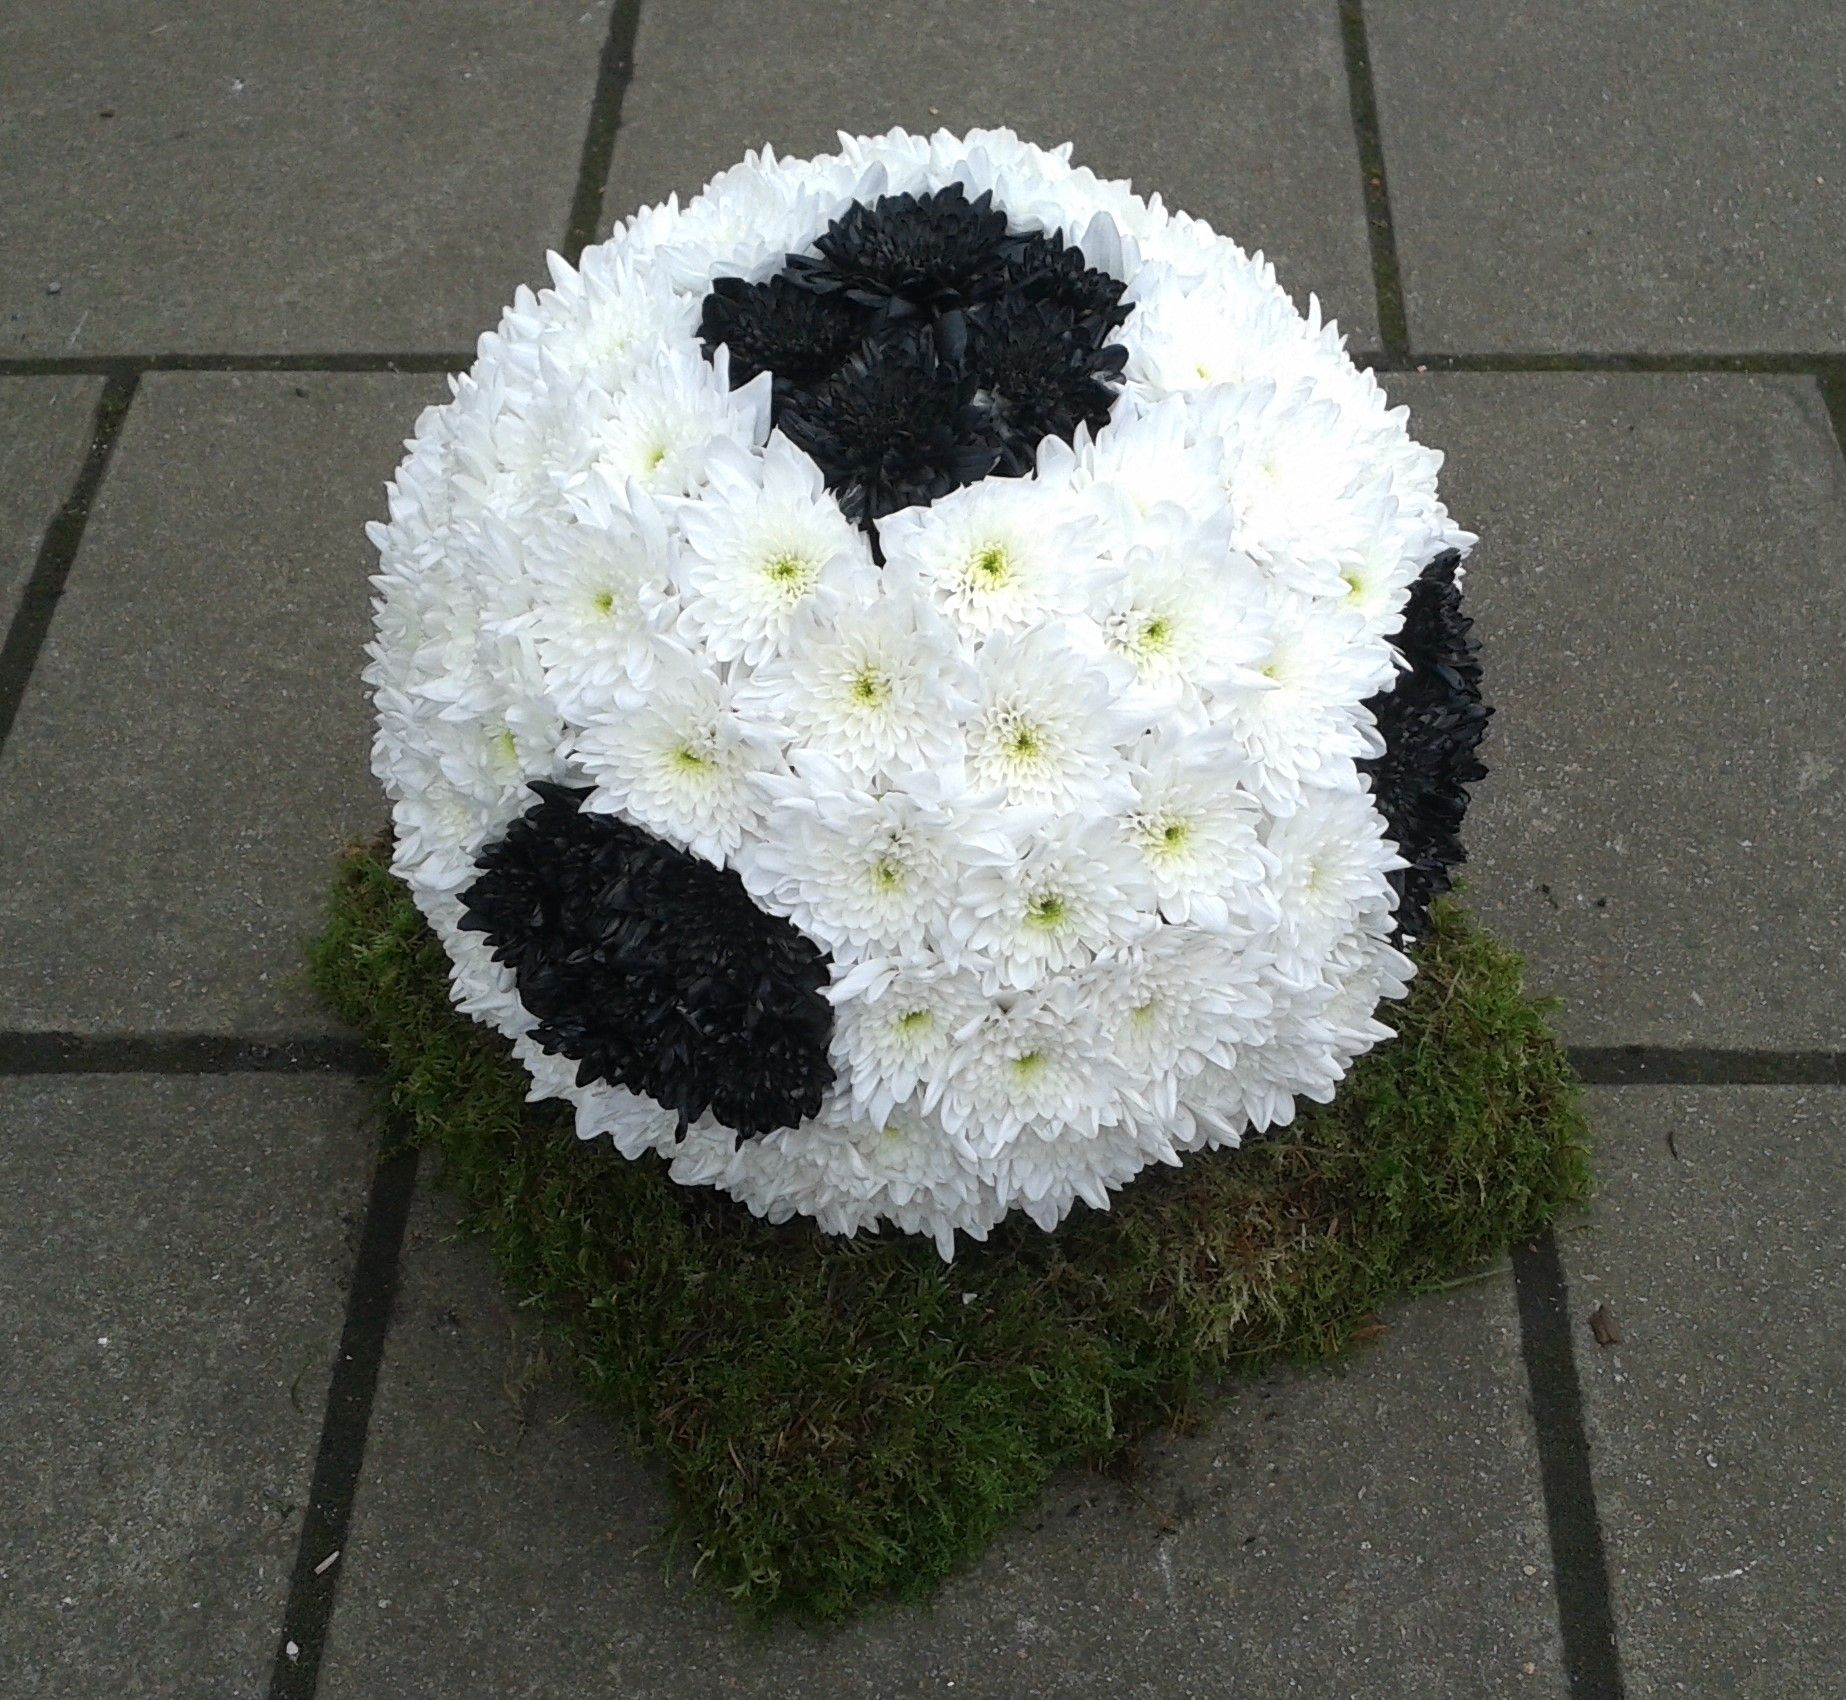 3d football funeral tribute seasons funeral tributes pinterest 3d football funeral tribute funeral tributesfuneral flowers izmirmasajfo